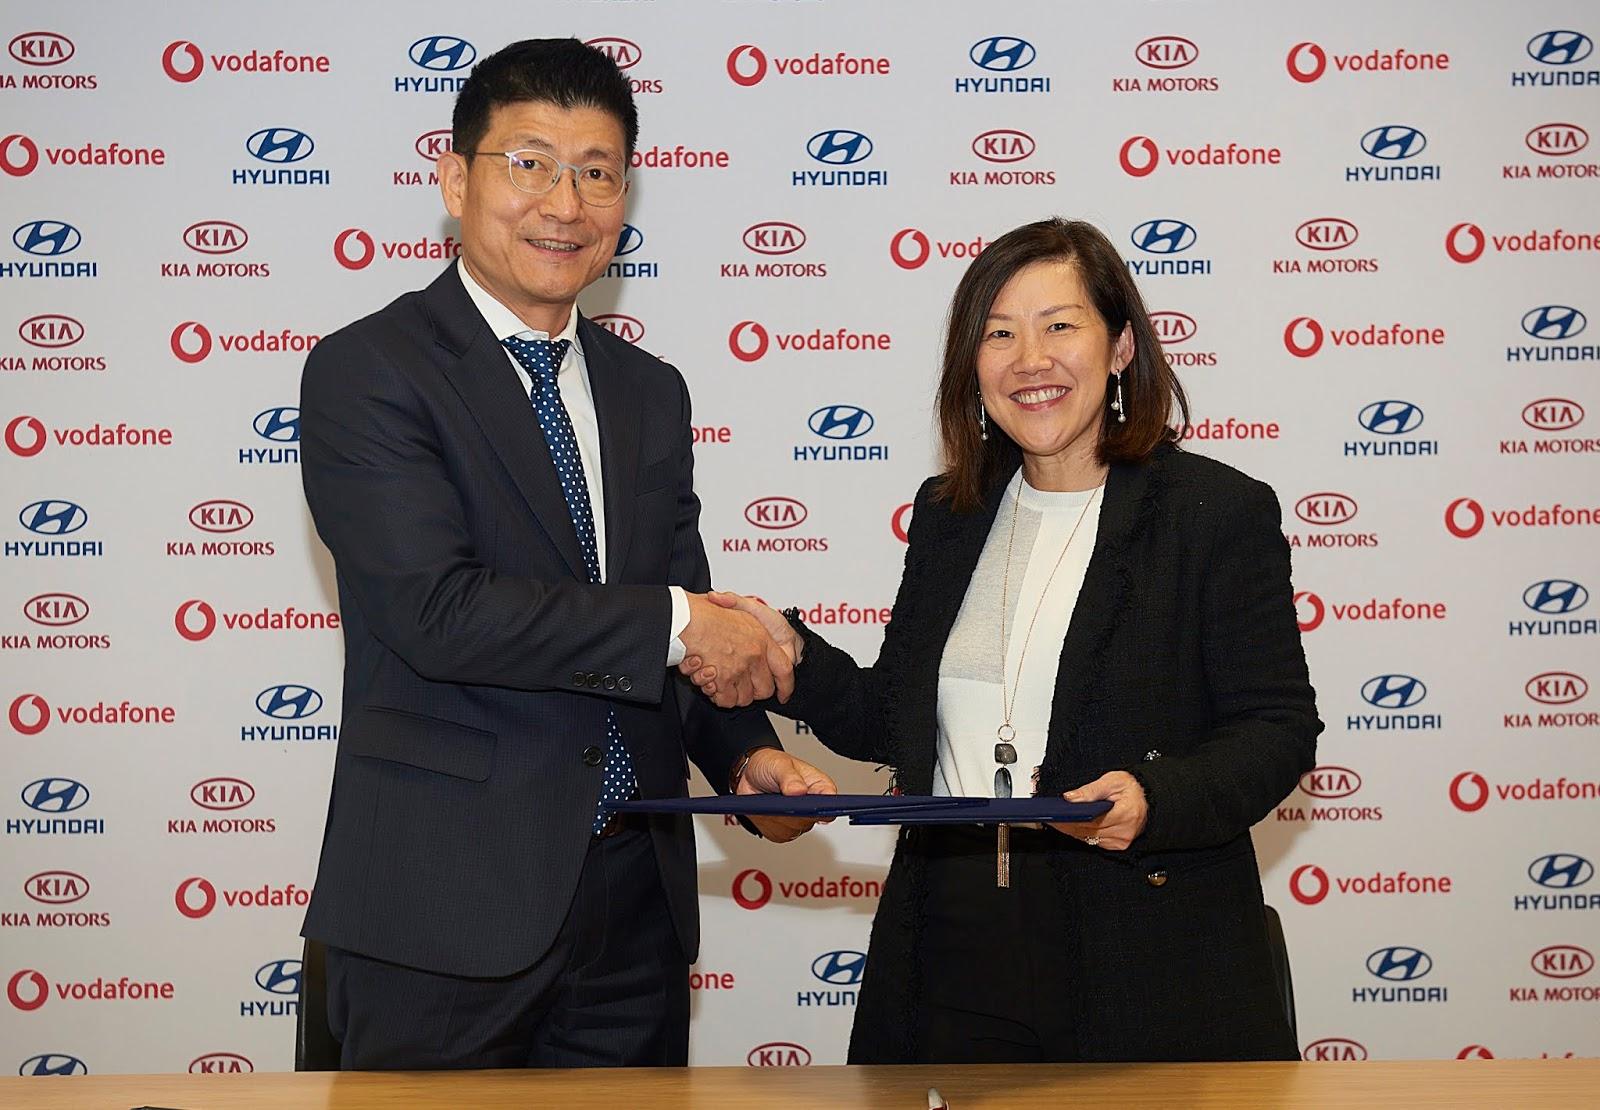 Photo2B12BHyundai2Band2BKia2BEnter2BStrategic2BPartnership2Bwith2BVodafone Hyundai-Kia υπογράφουν συνεργασία με τη Vodafone Hyundai, Hyundai Ελλάς